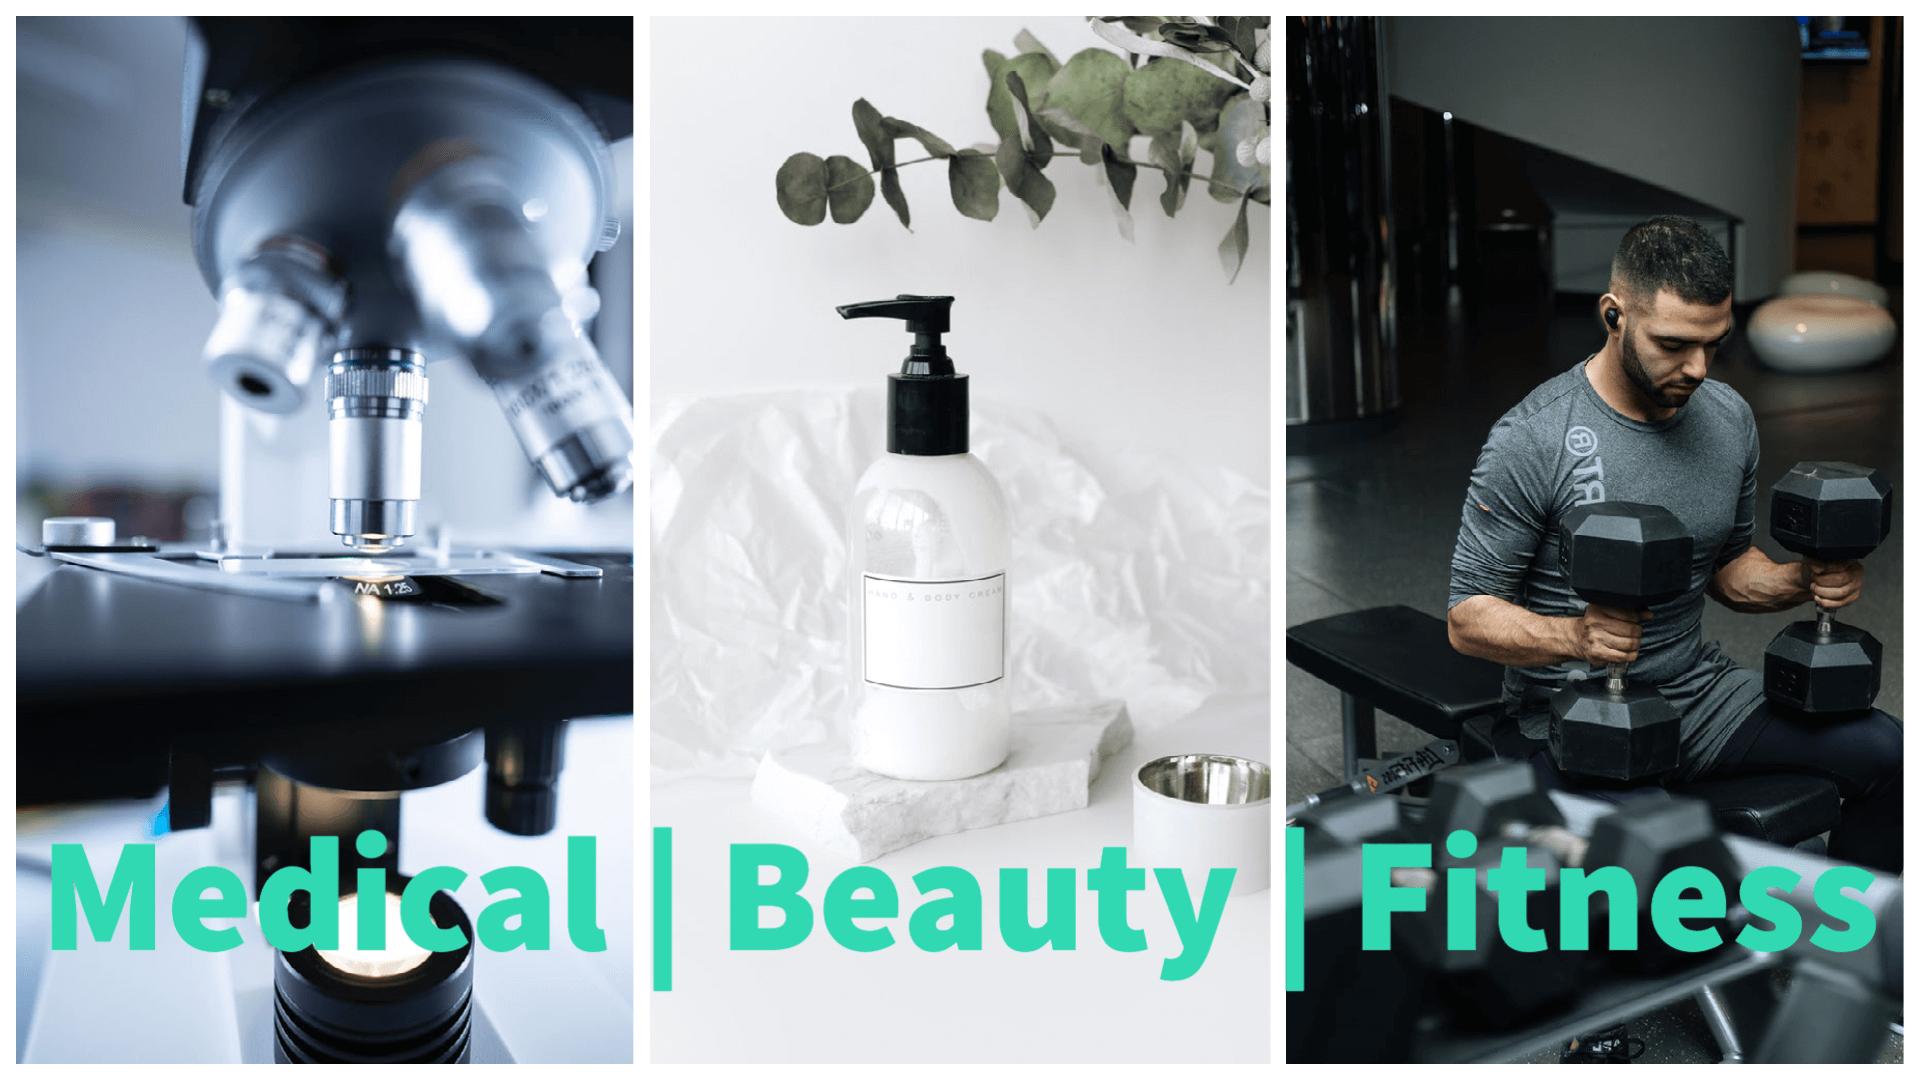 beauty-fitness-medical-ipharmerci